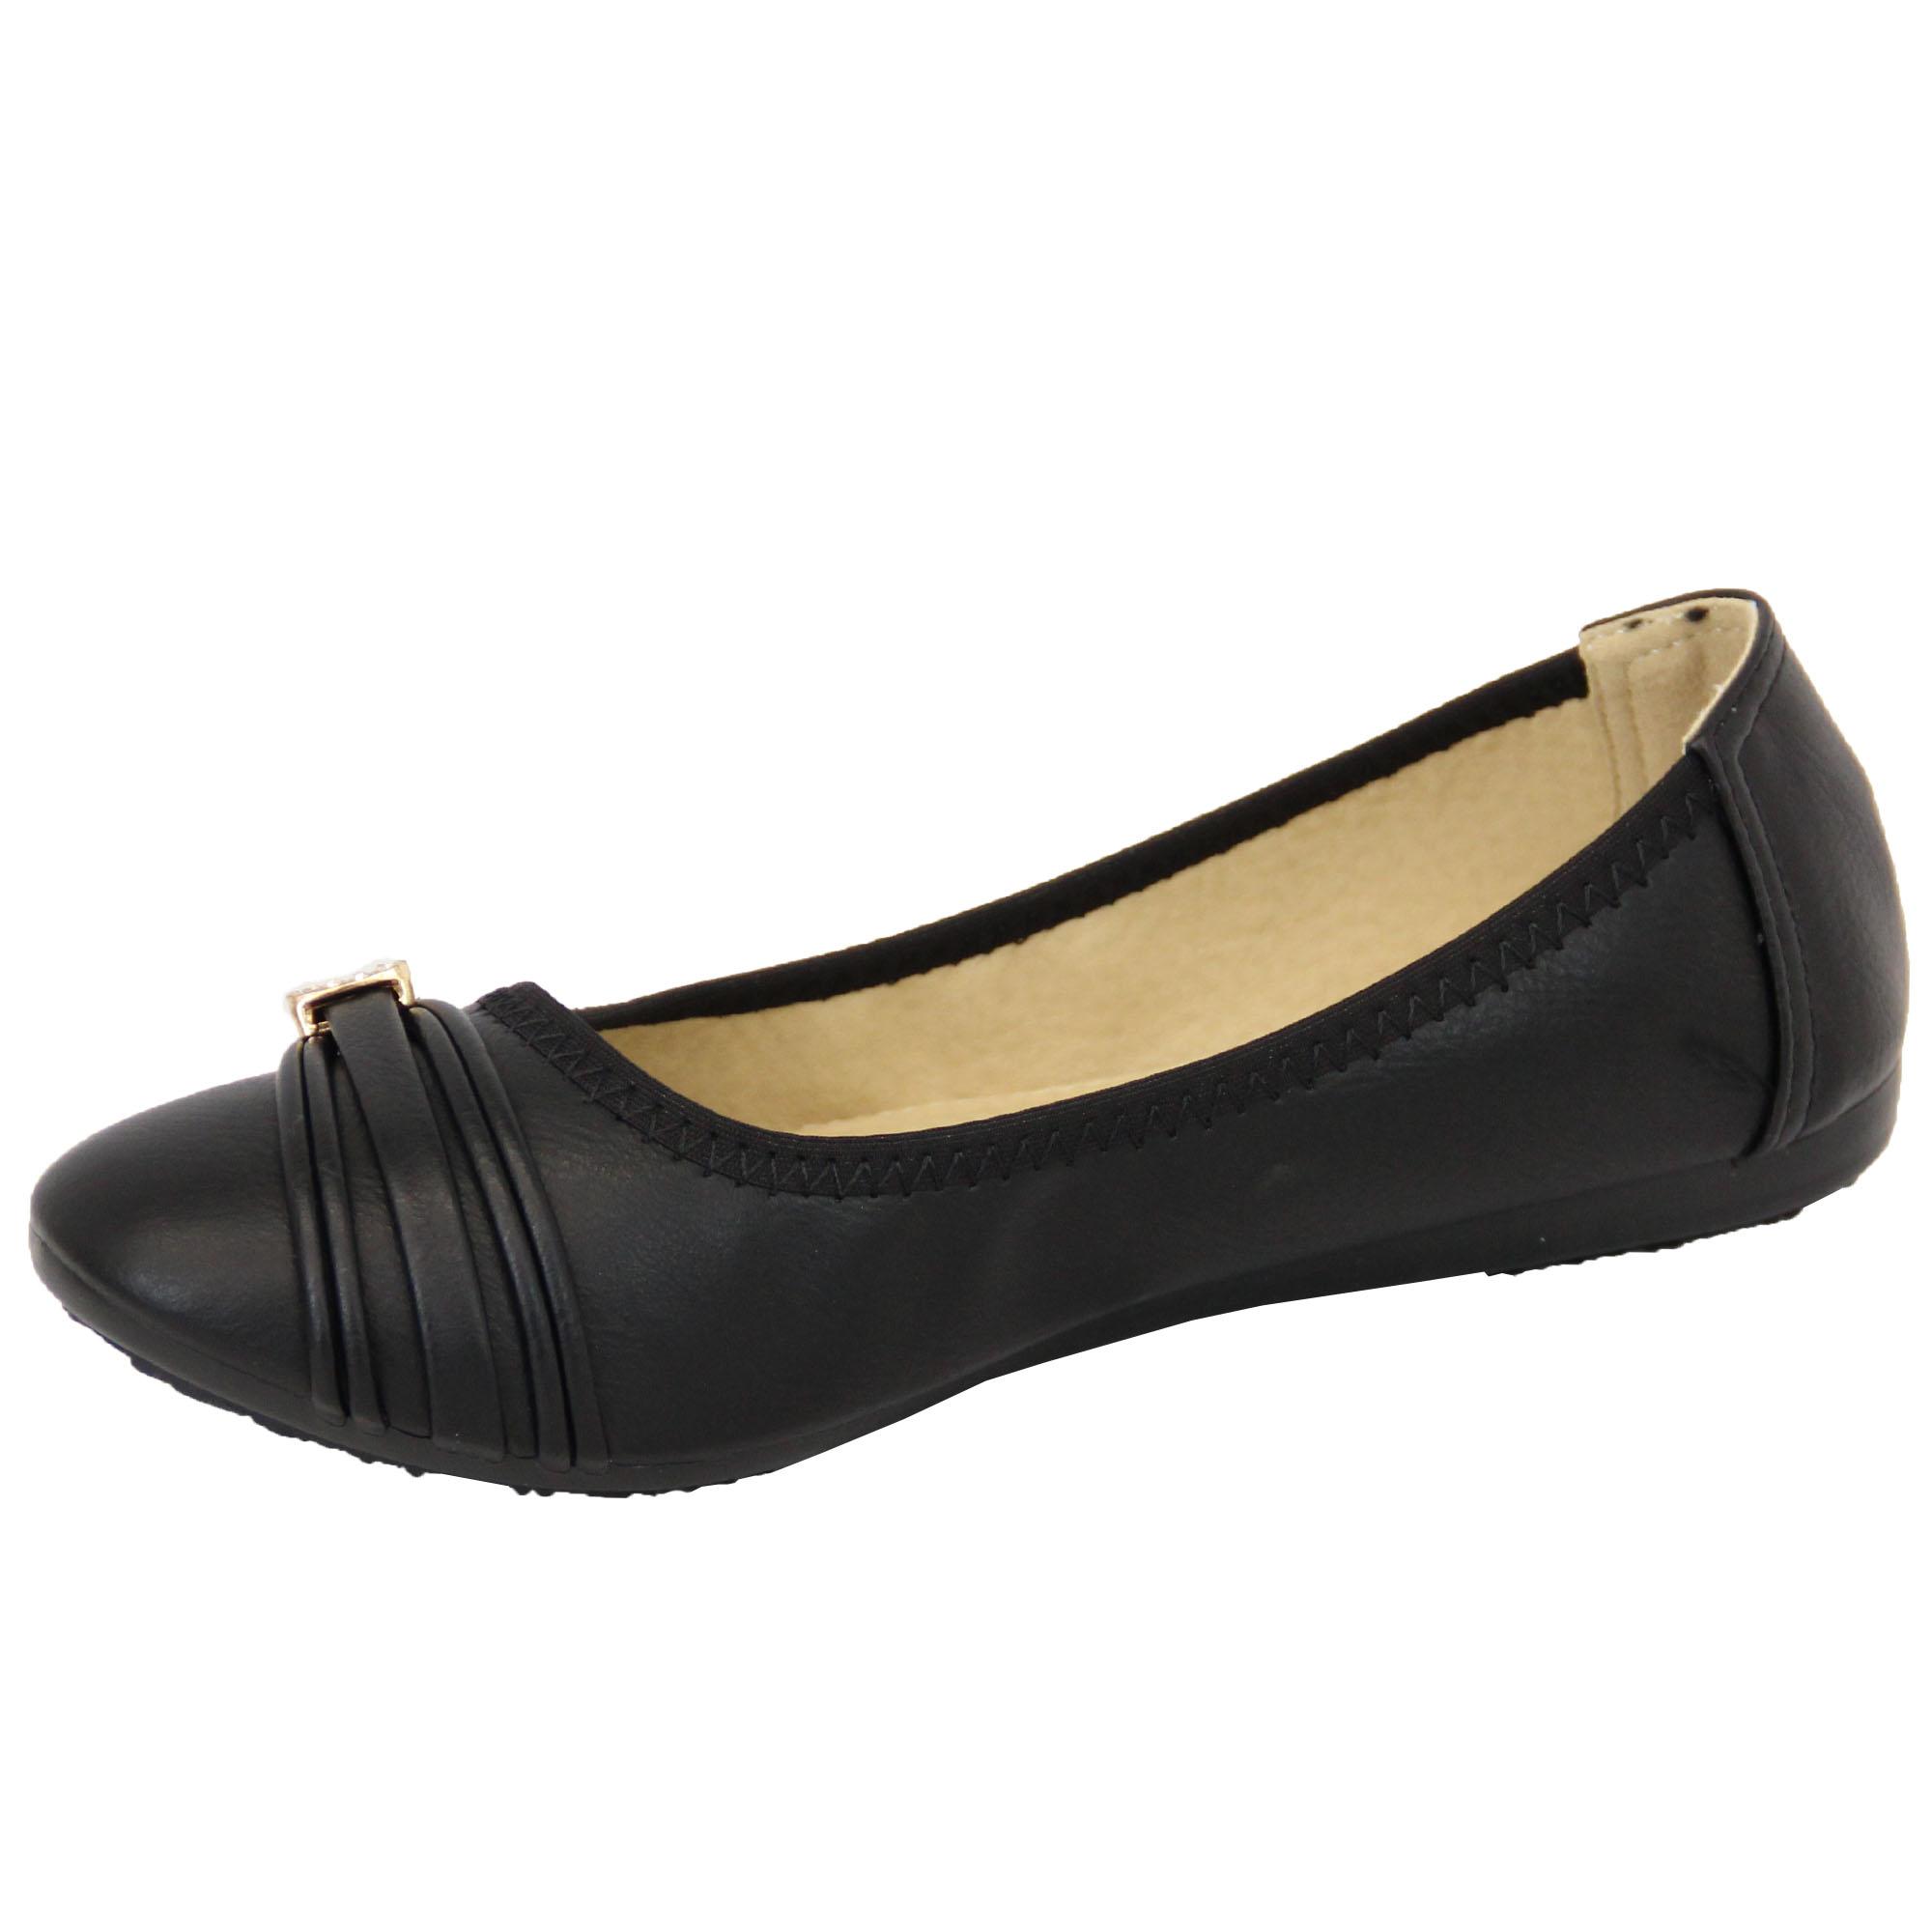 m dchen ballerina schuhe kinder flache pumps lack slipper. Black Bedroom Furniture Sets. Home Design Ideas